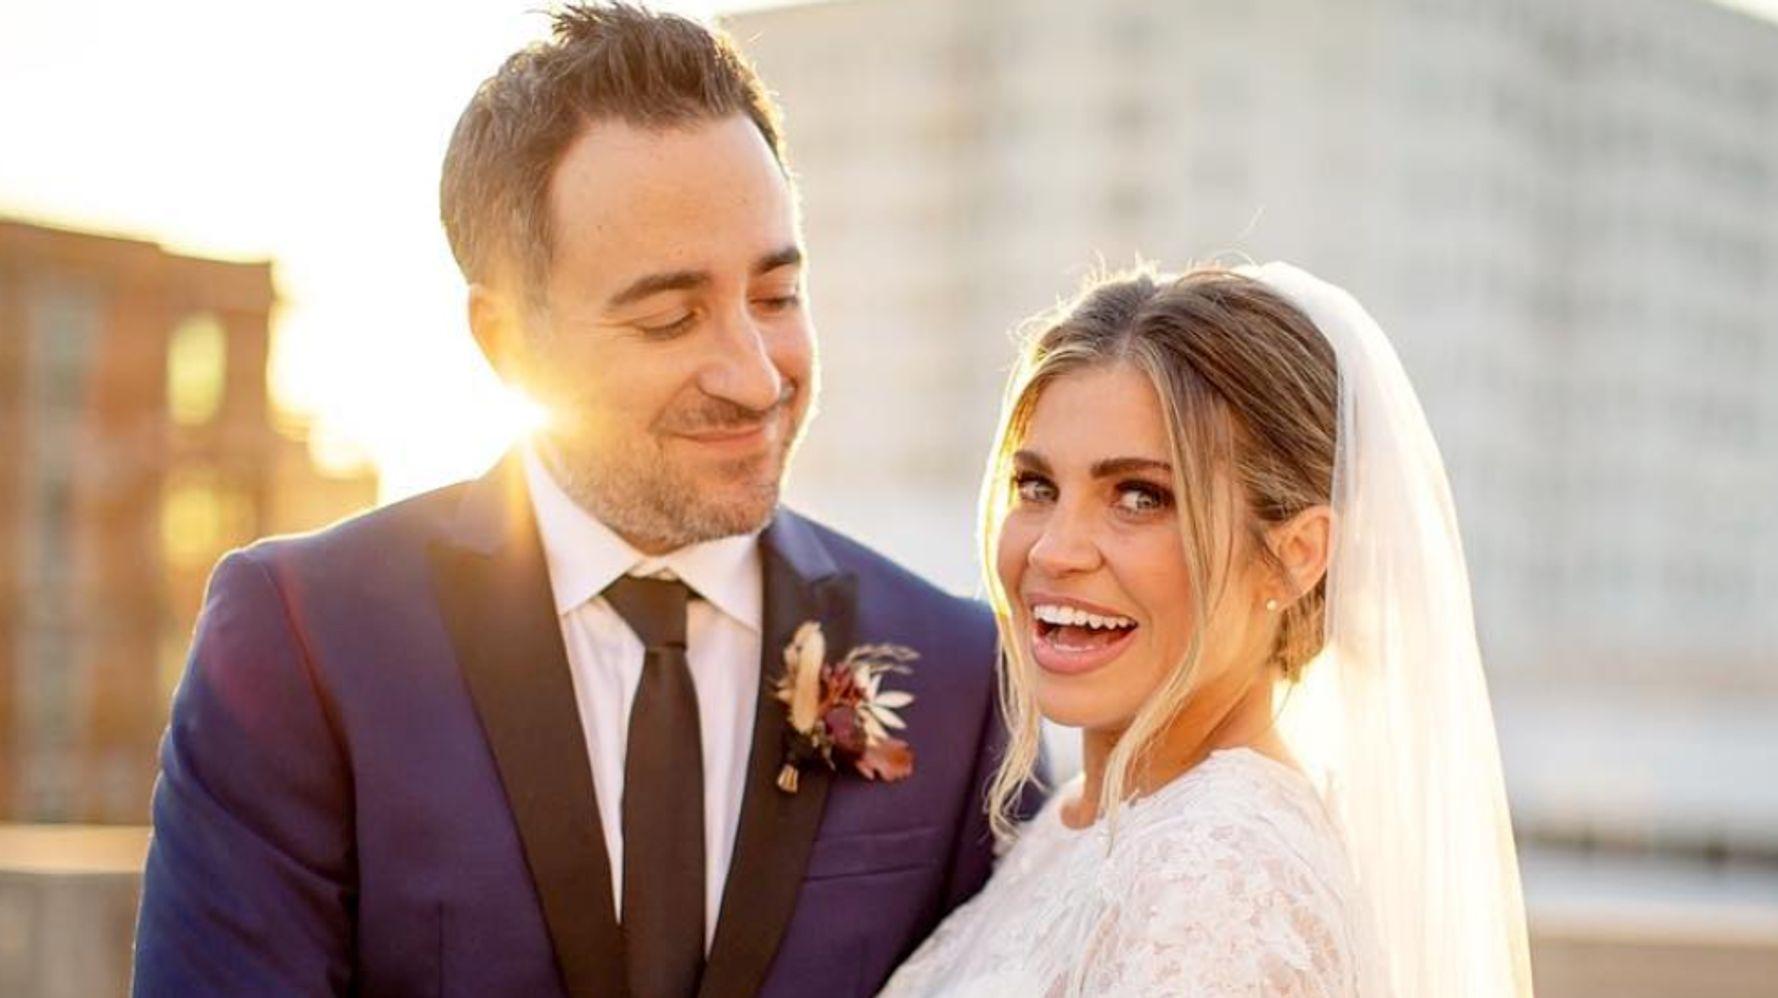 Danielle Fishel Wedding.Danielle Fishel Of Boy Meets World Marries Jensen Karp Huffpost Life